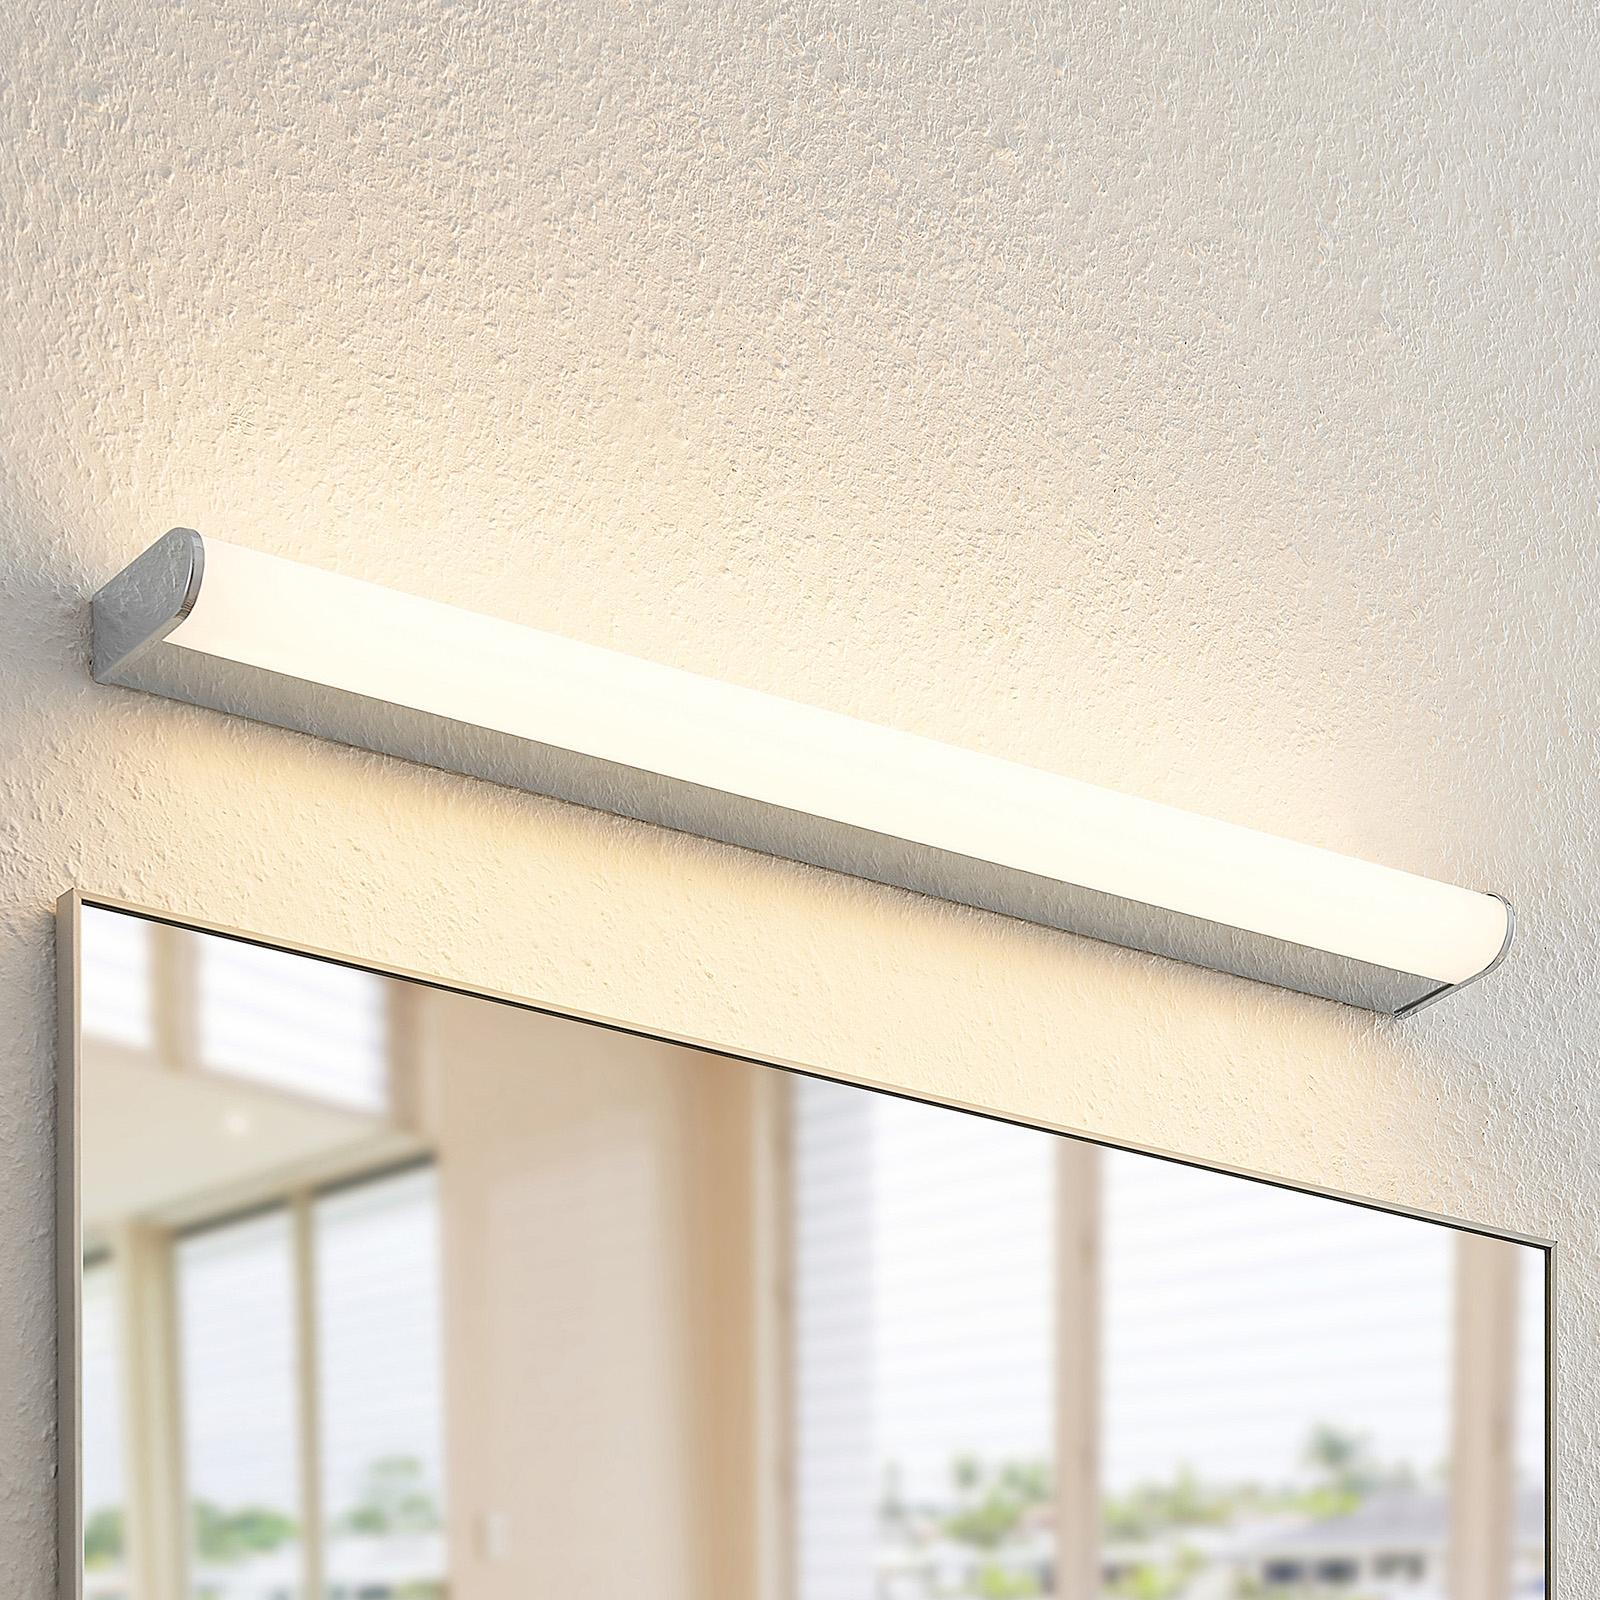 Arcchio Ecaterina kylpyhuoneen LED-lamppu, 70 cm